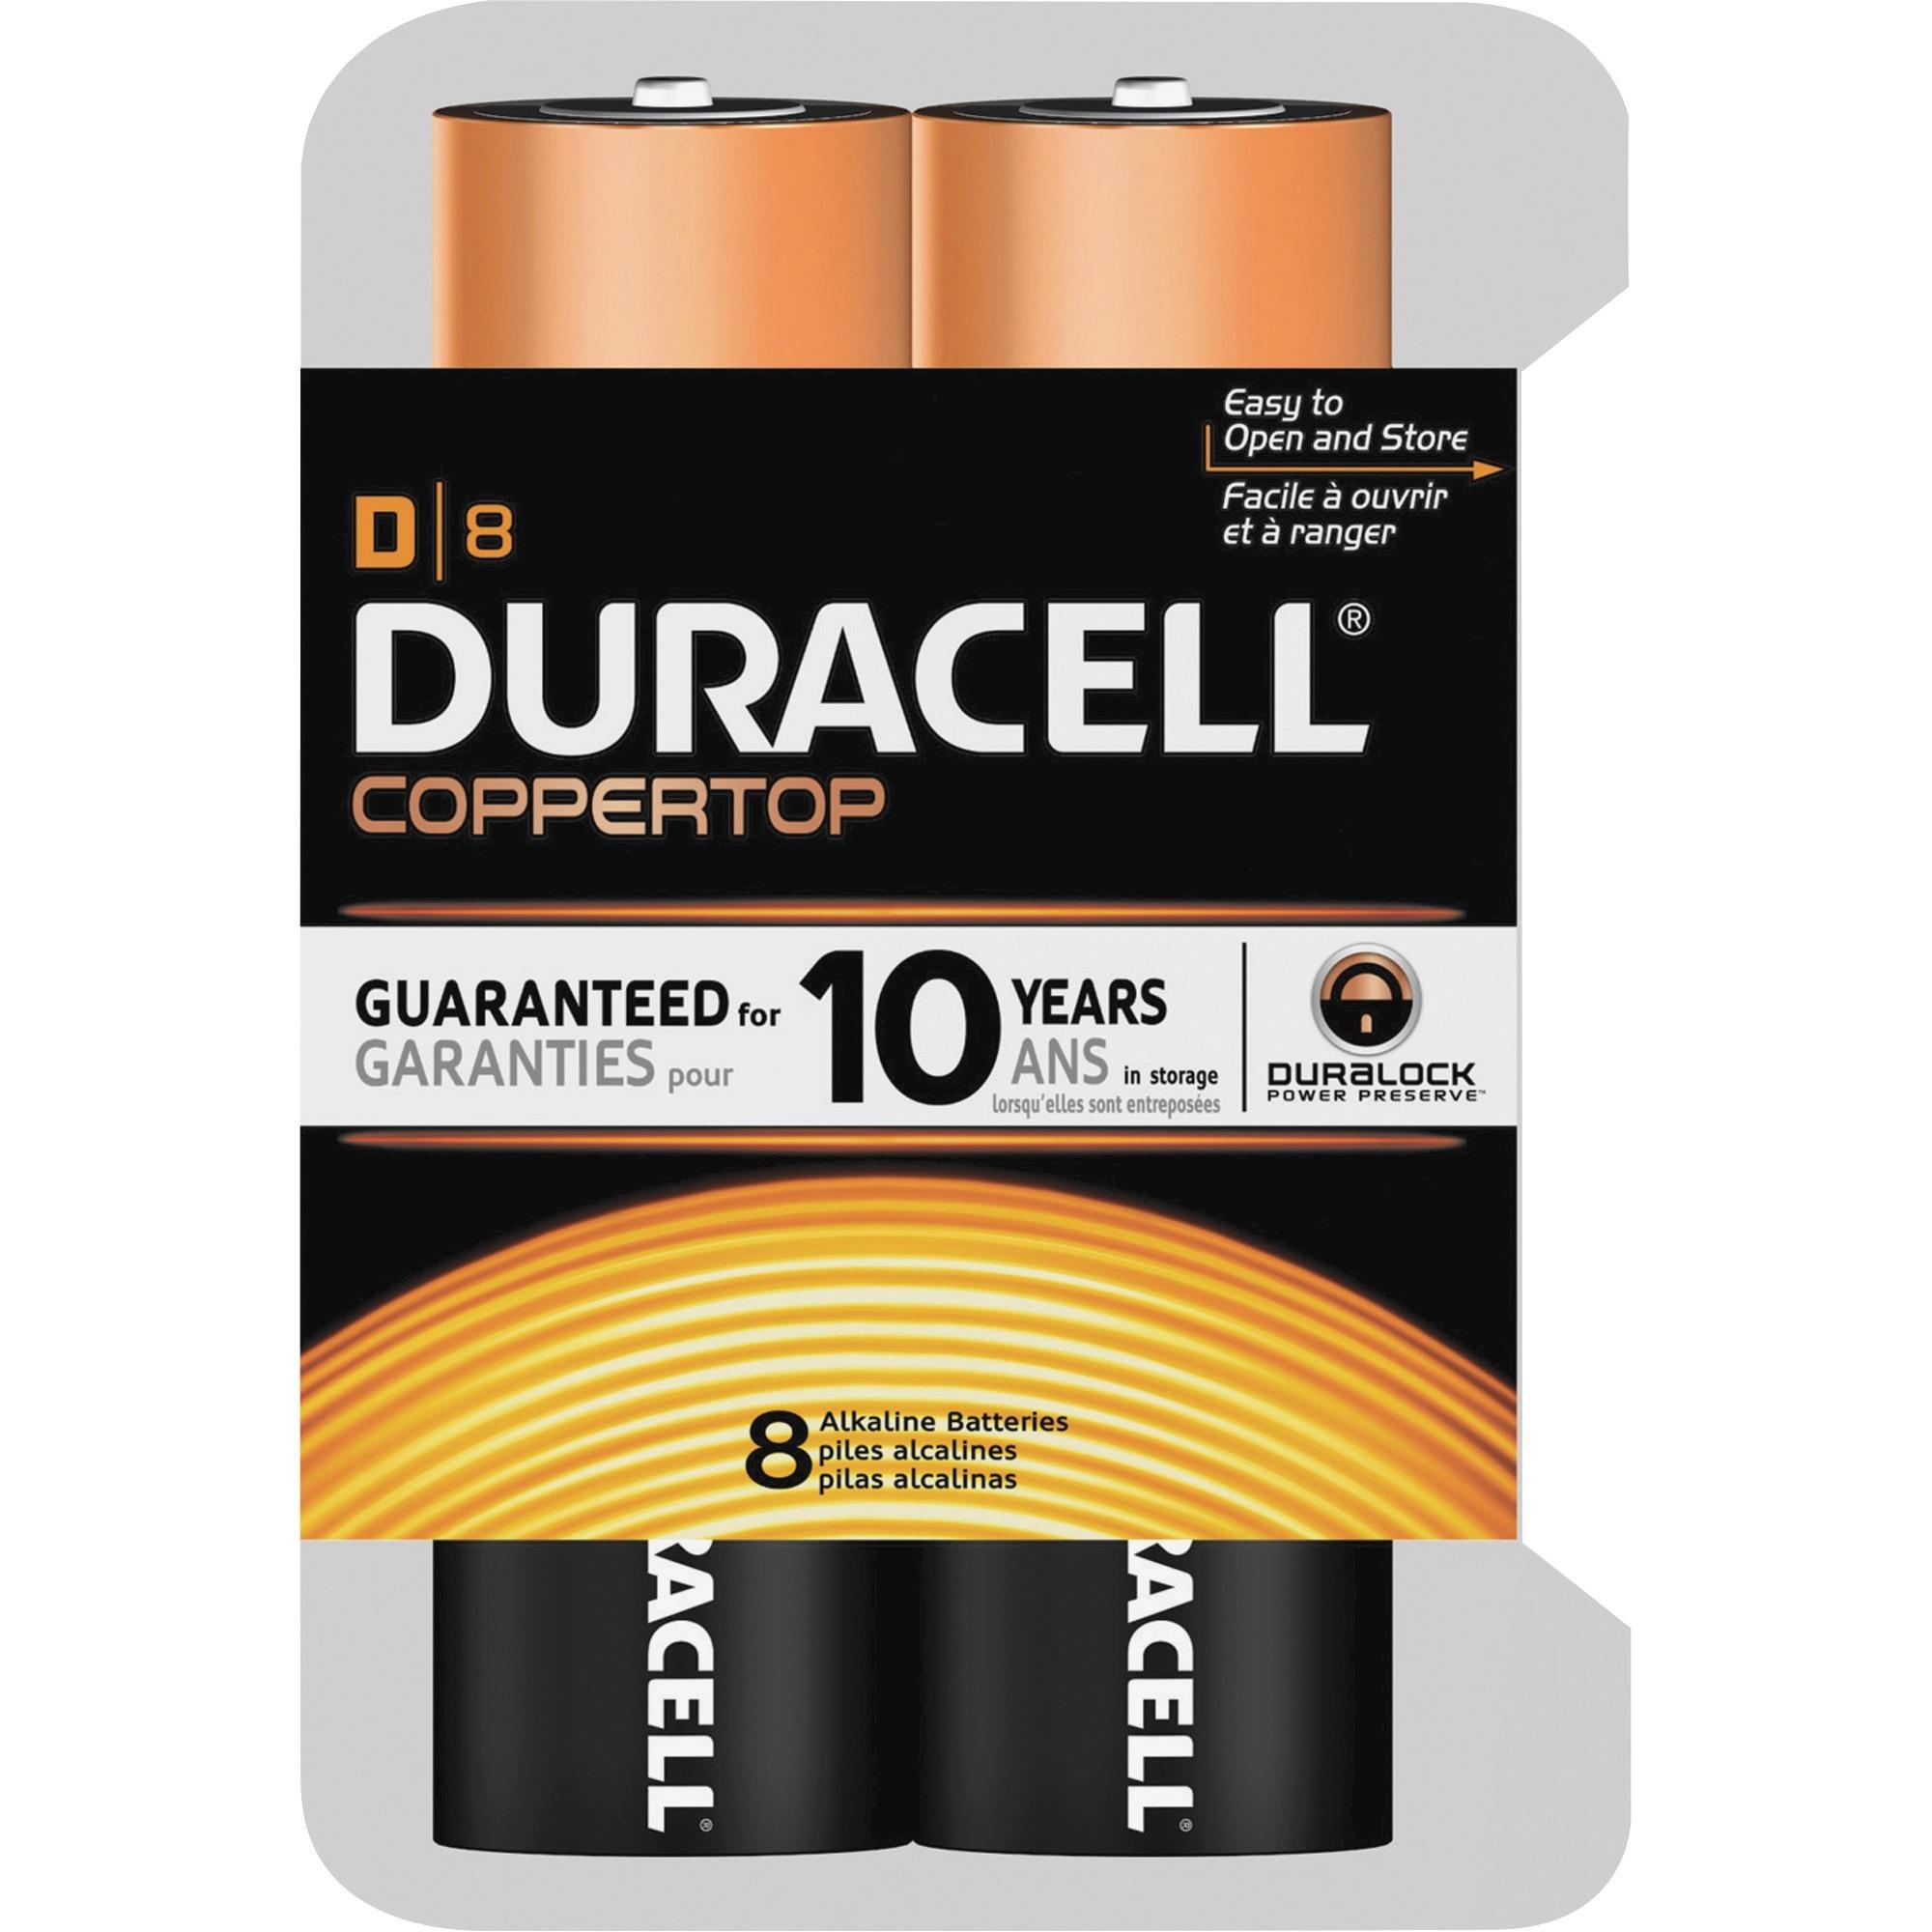 Duracell Coppertop Alkaline D Batteries, 8 Count